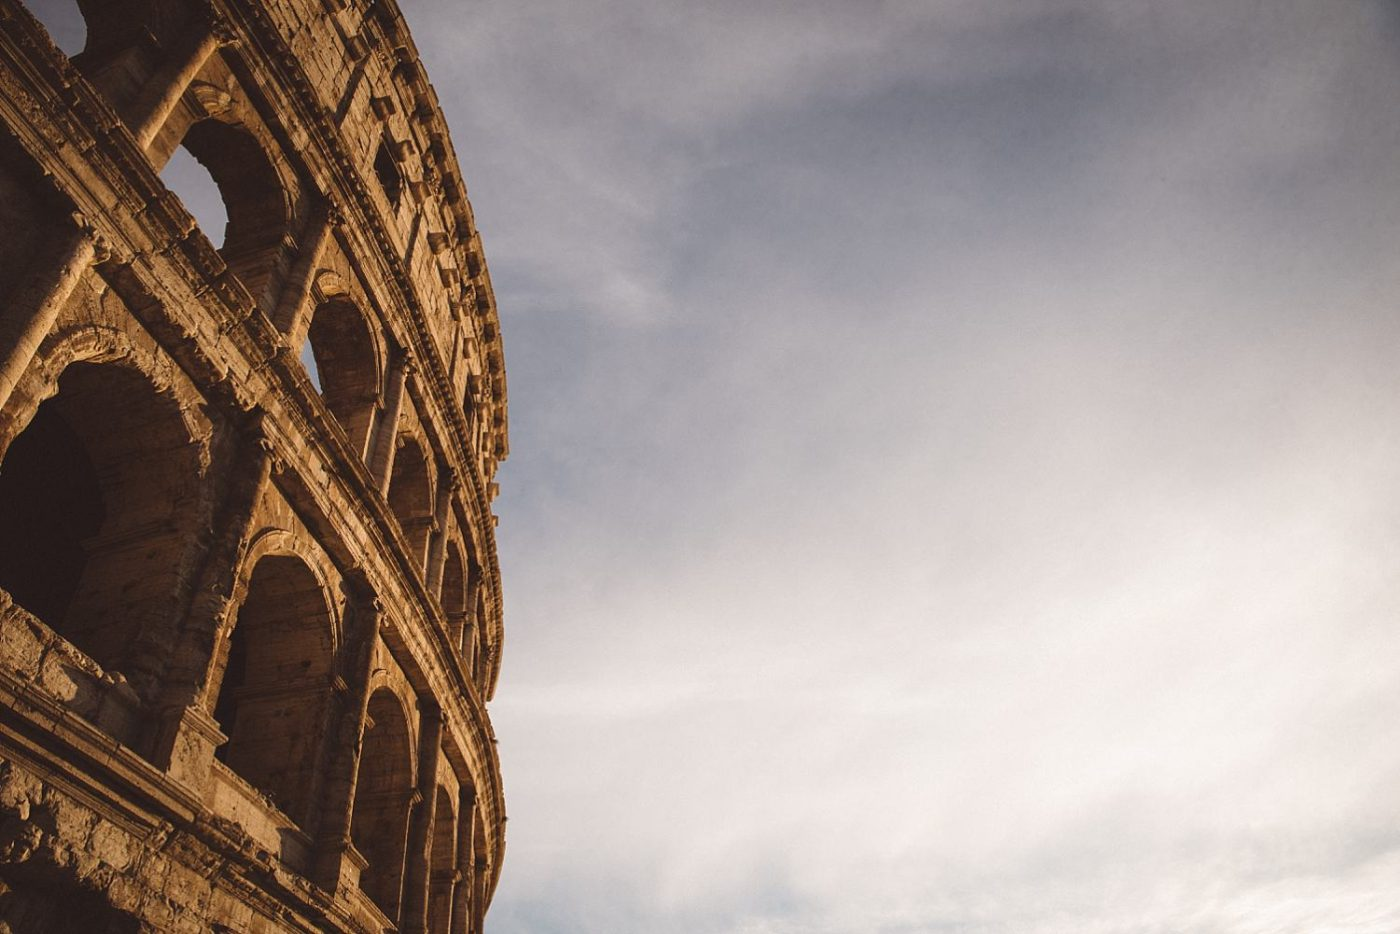 The Colosseum Rome moody photo